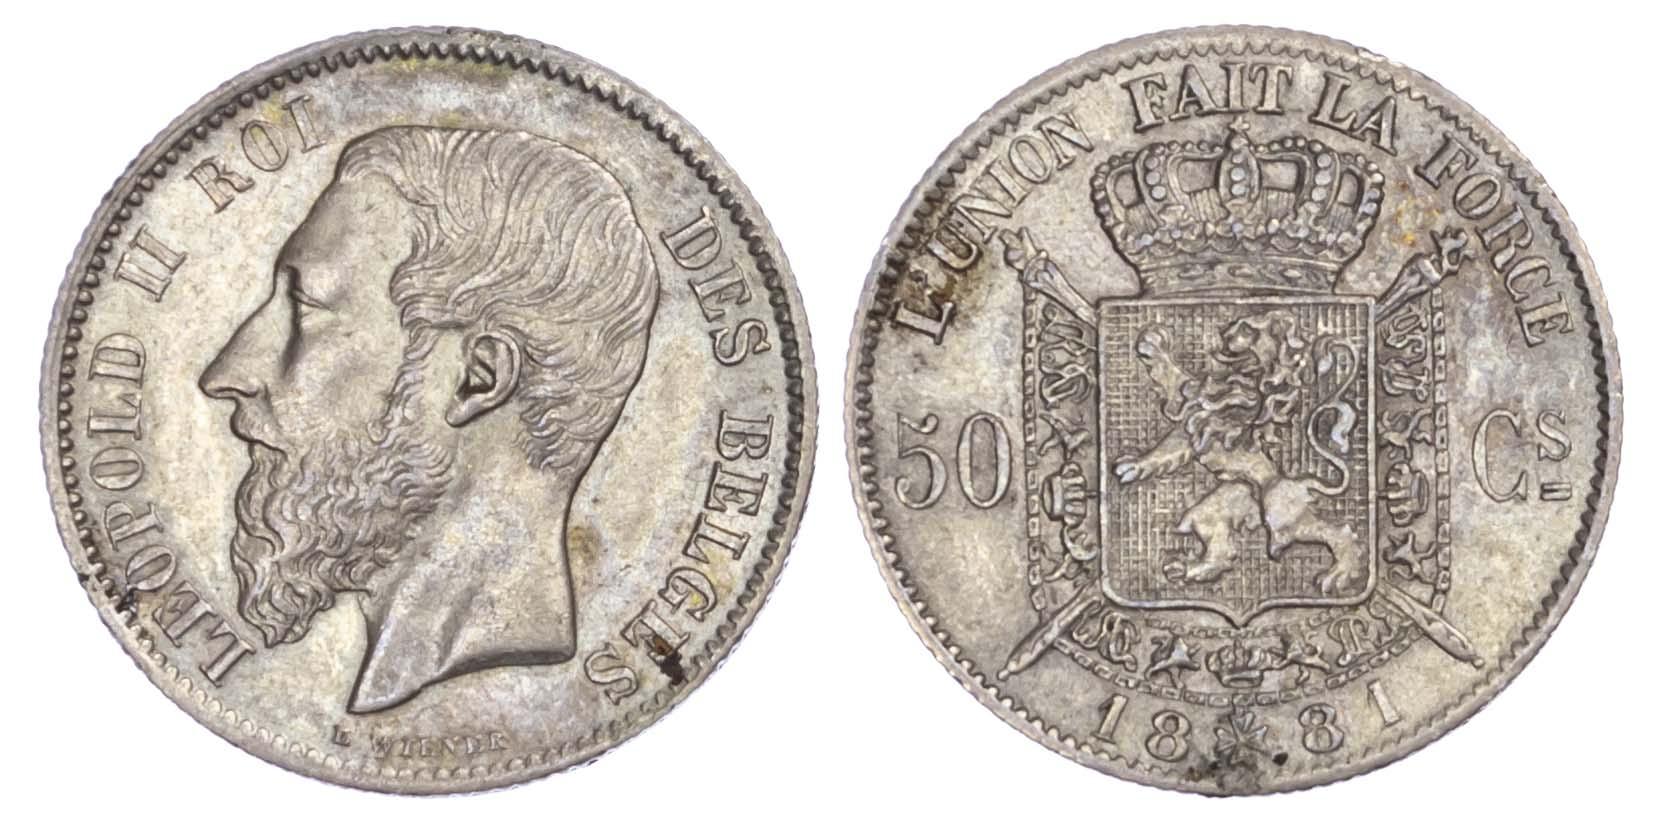 Belgium, Leopold II (1865-1910), silver 50 Centimes, 1881